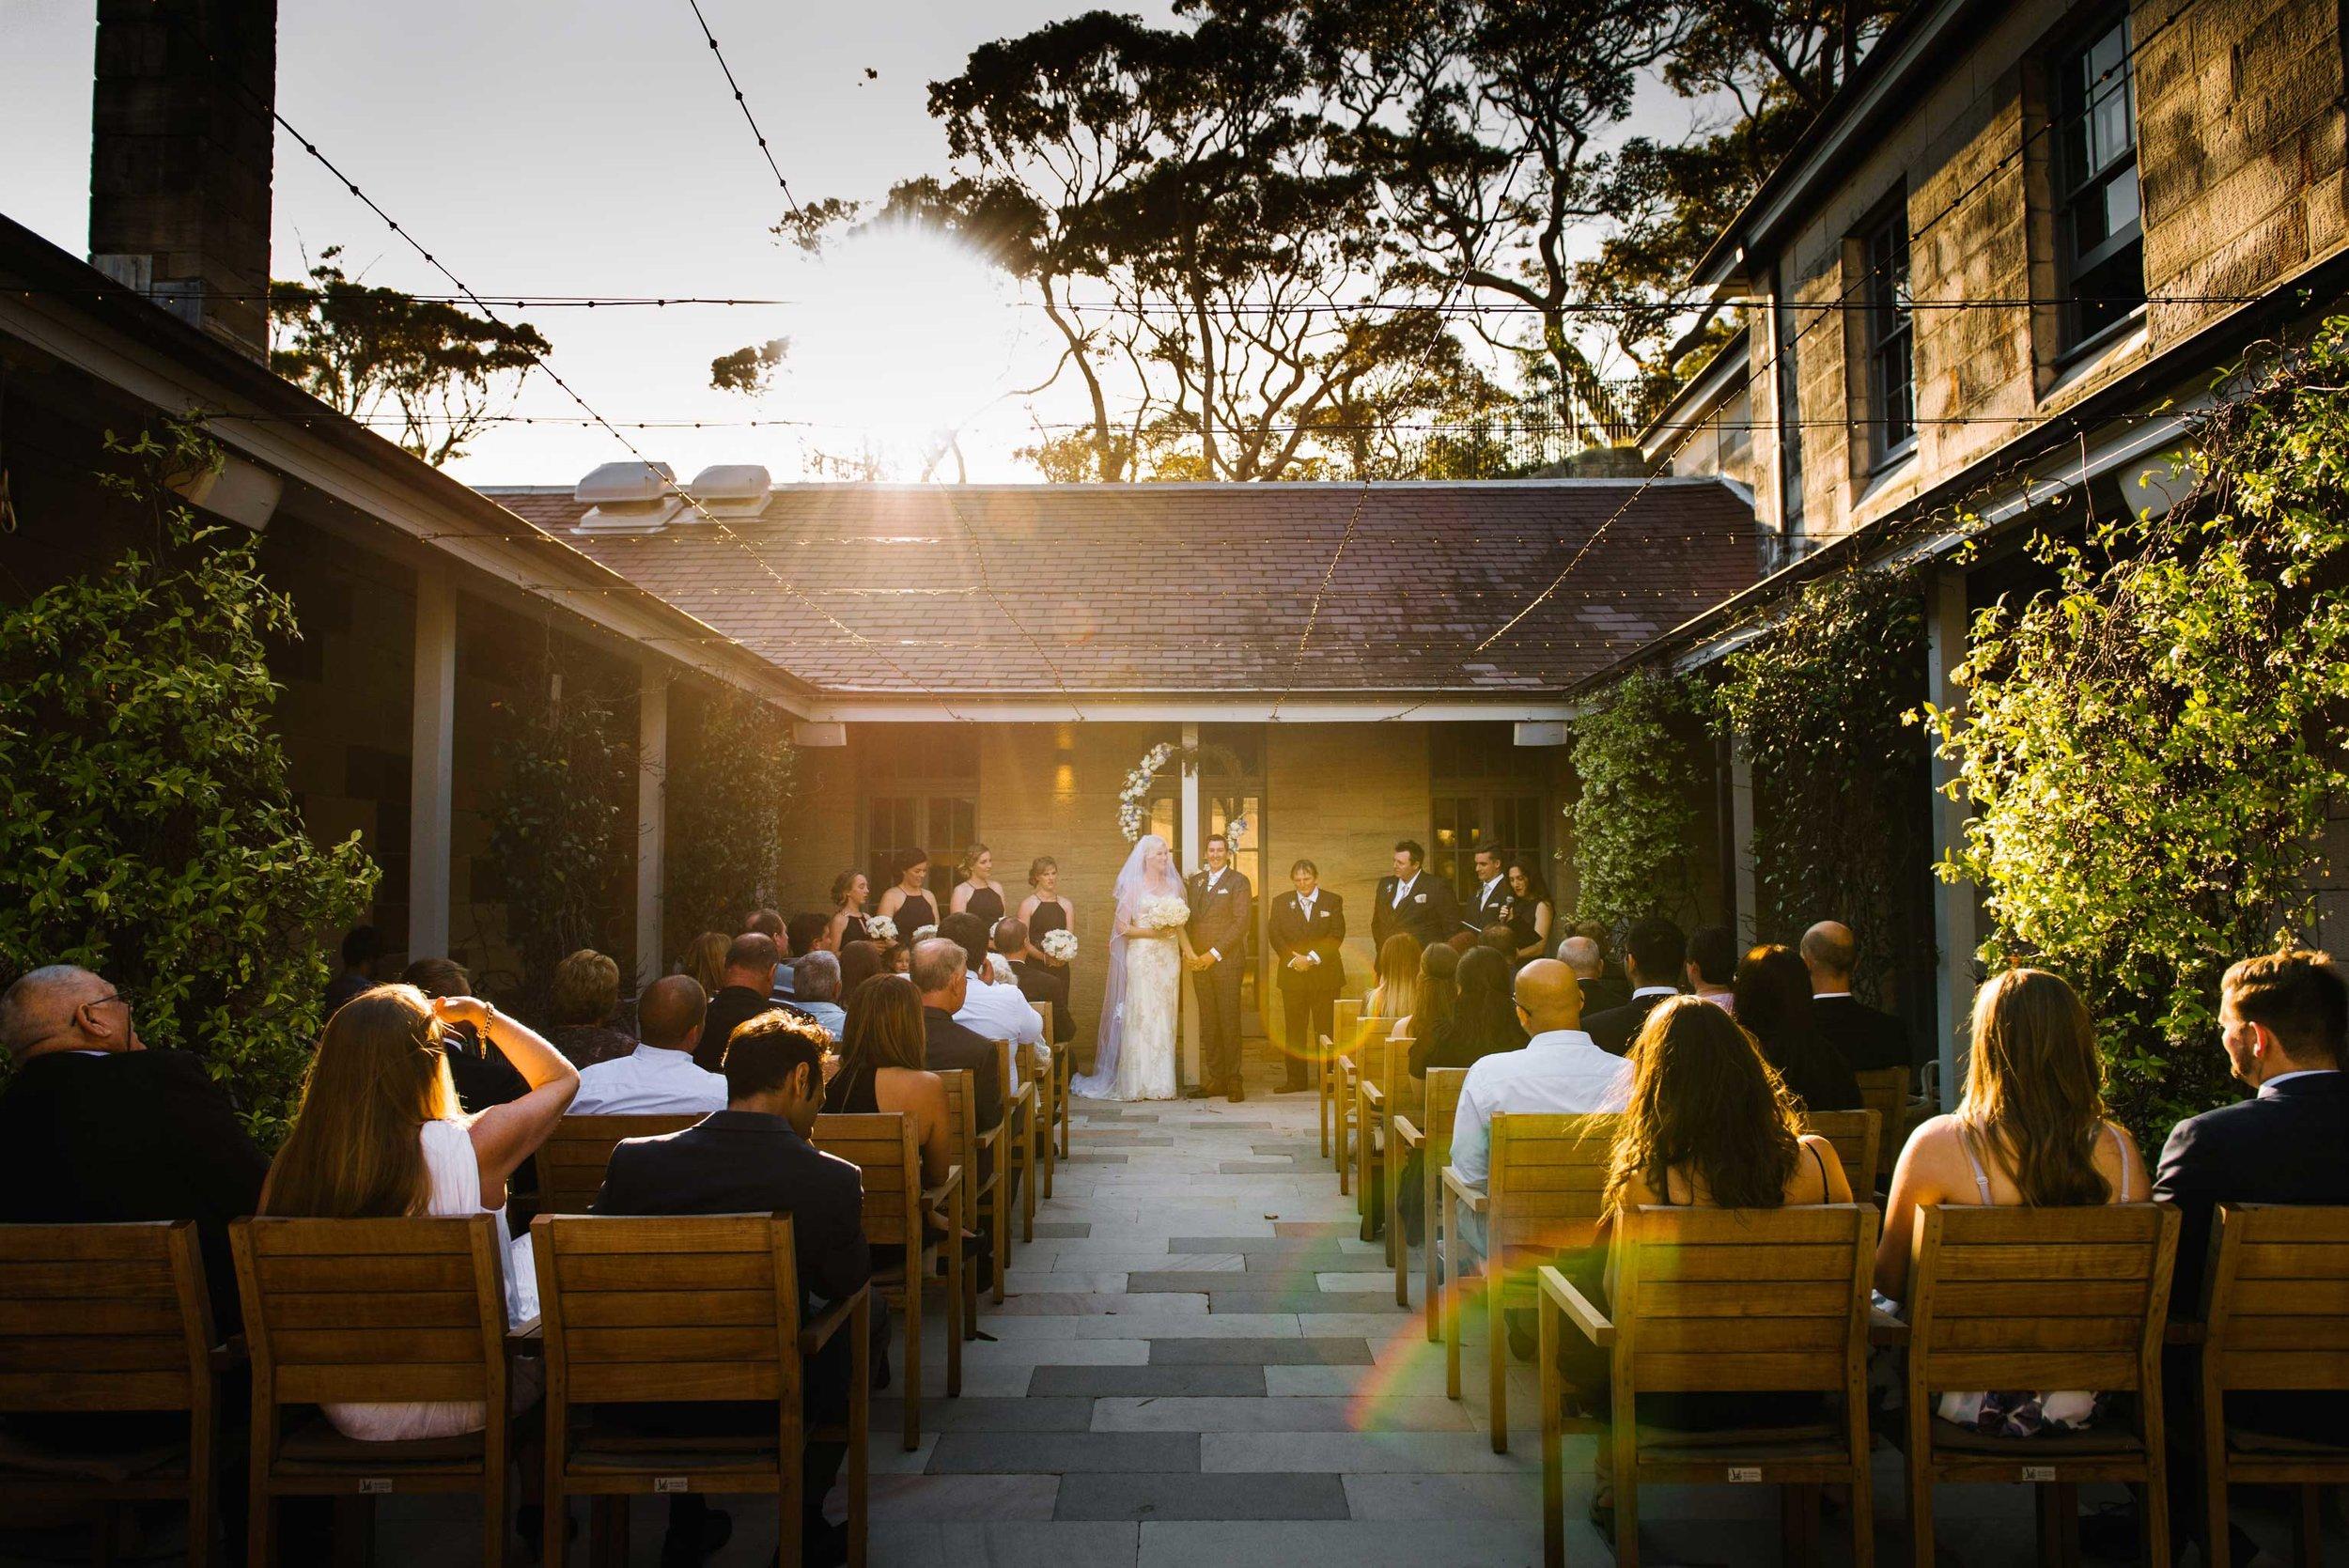 Wedding ceremony in courtyard at Gunners Barracks, Mosman